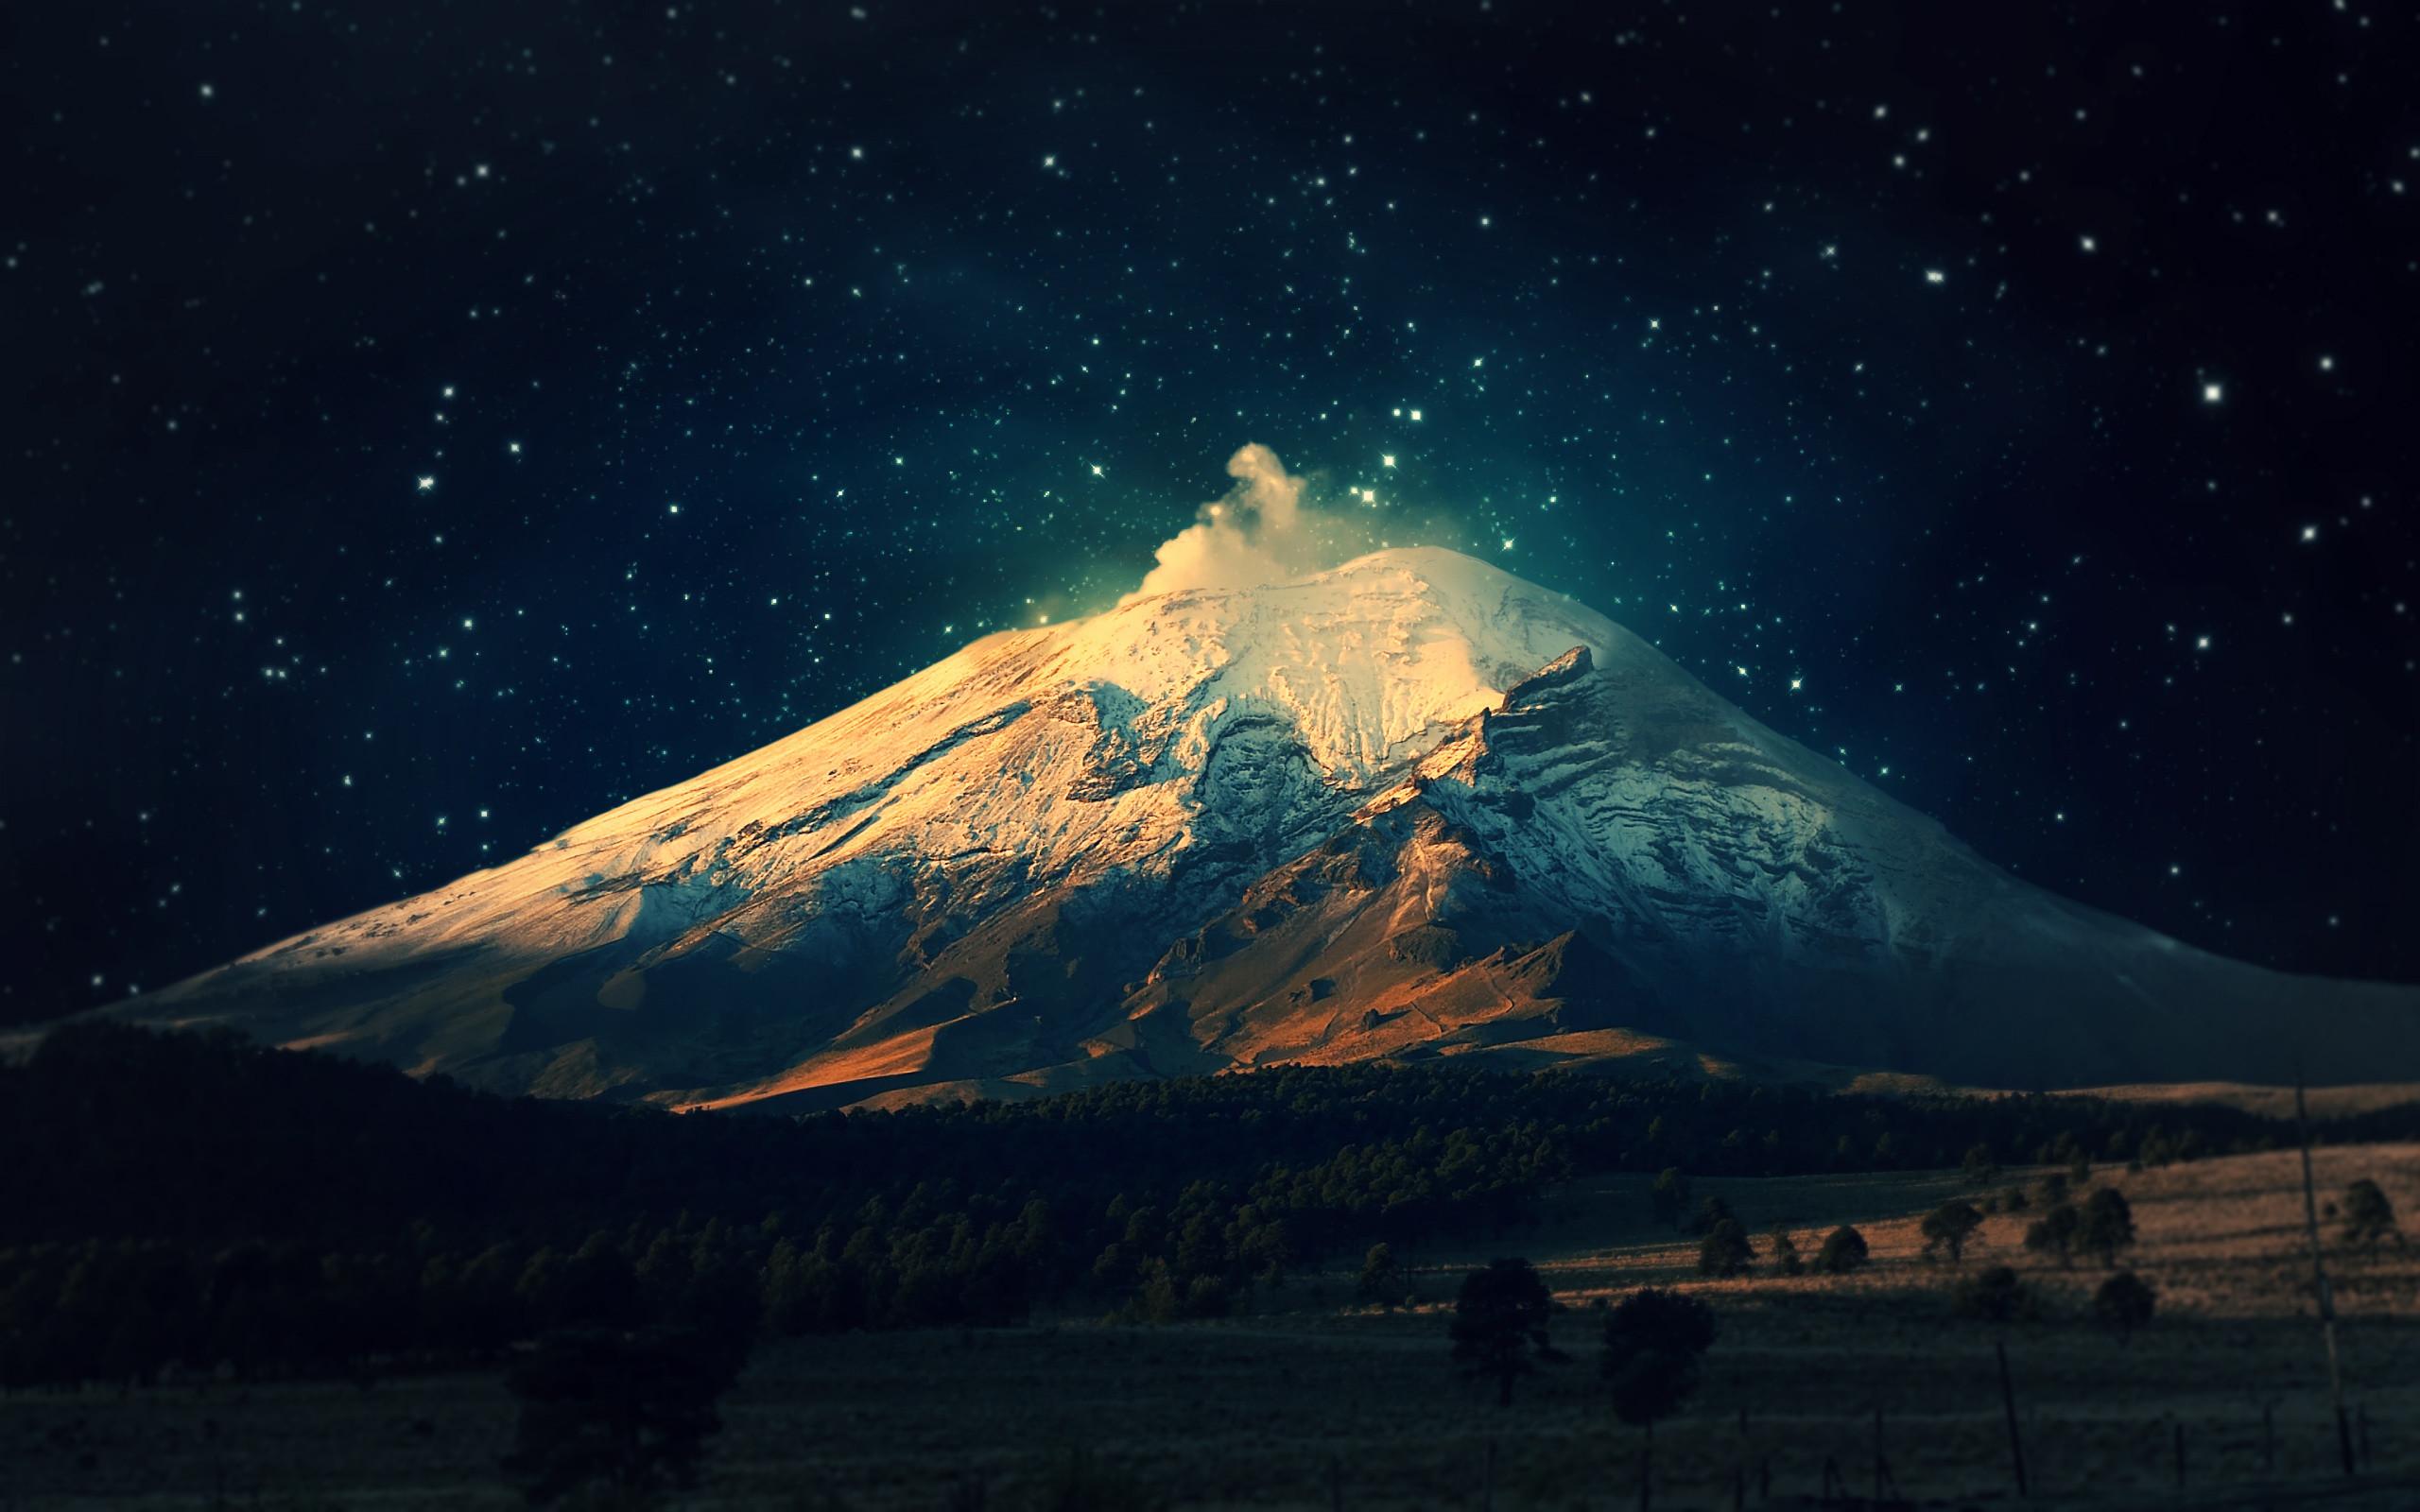 Download-free-stars-wallpaper-HD-desktop